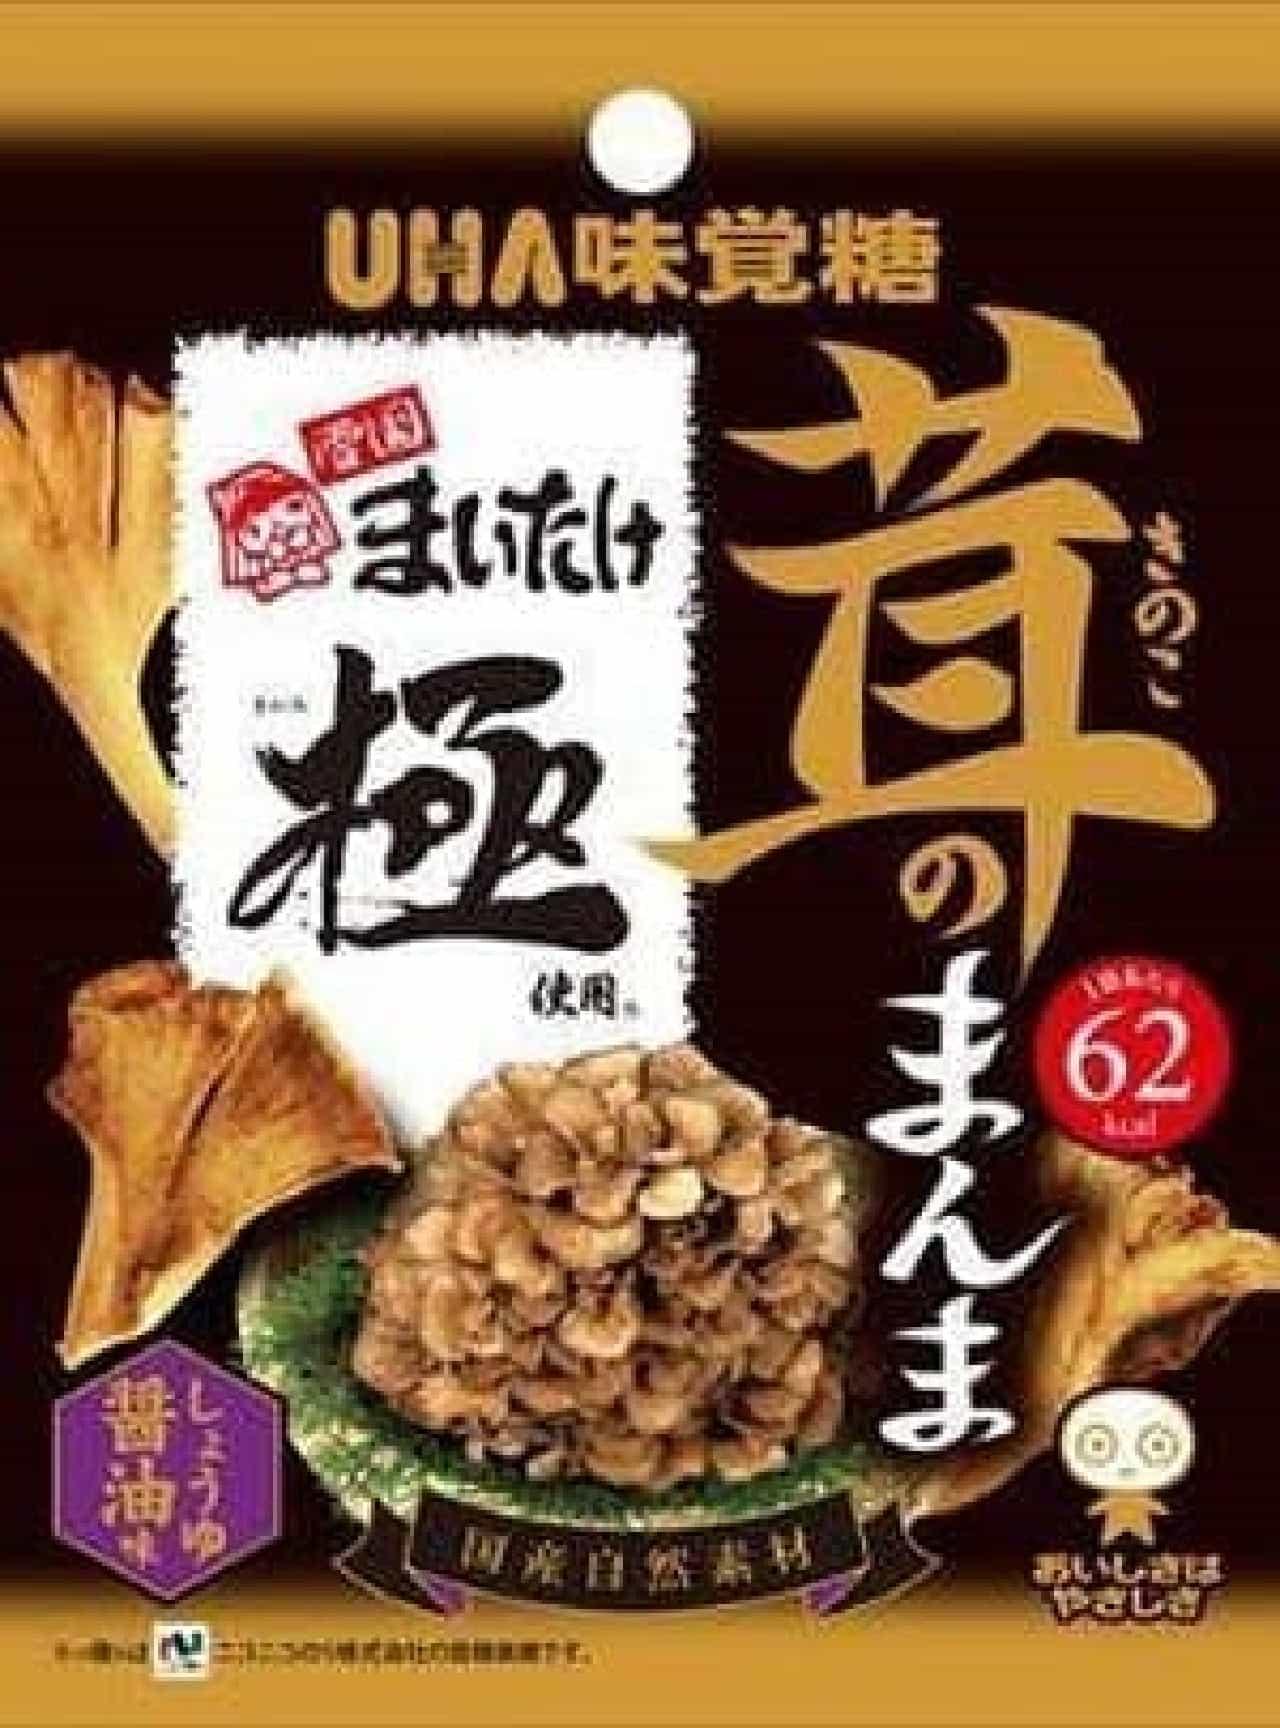 UHA味覚糖「茸のまんま まいたけ 醤油味」